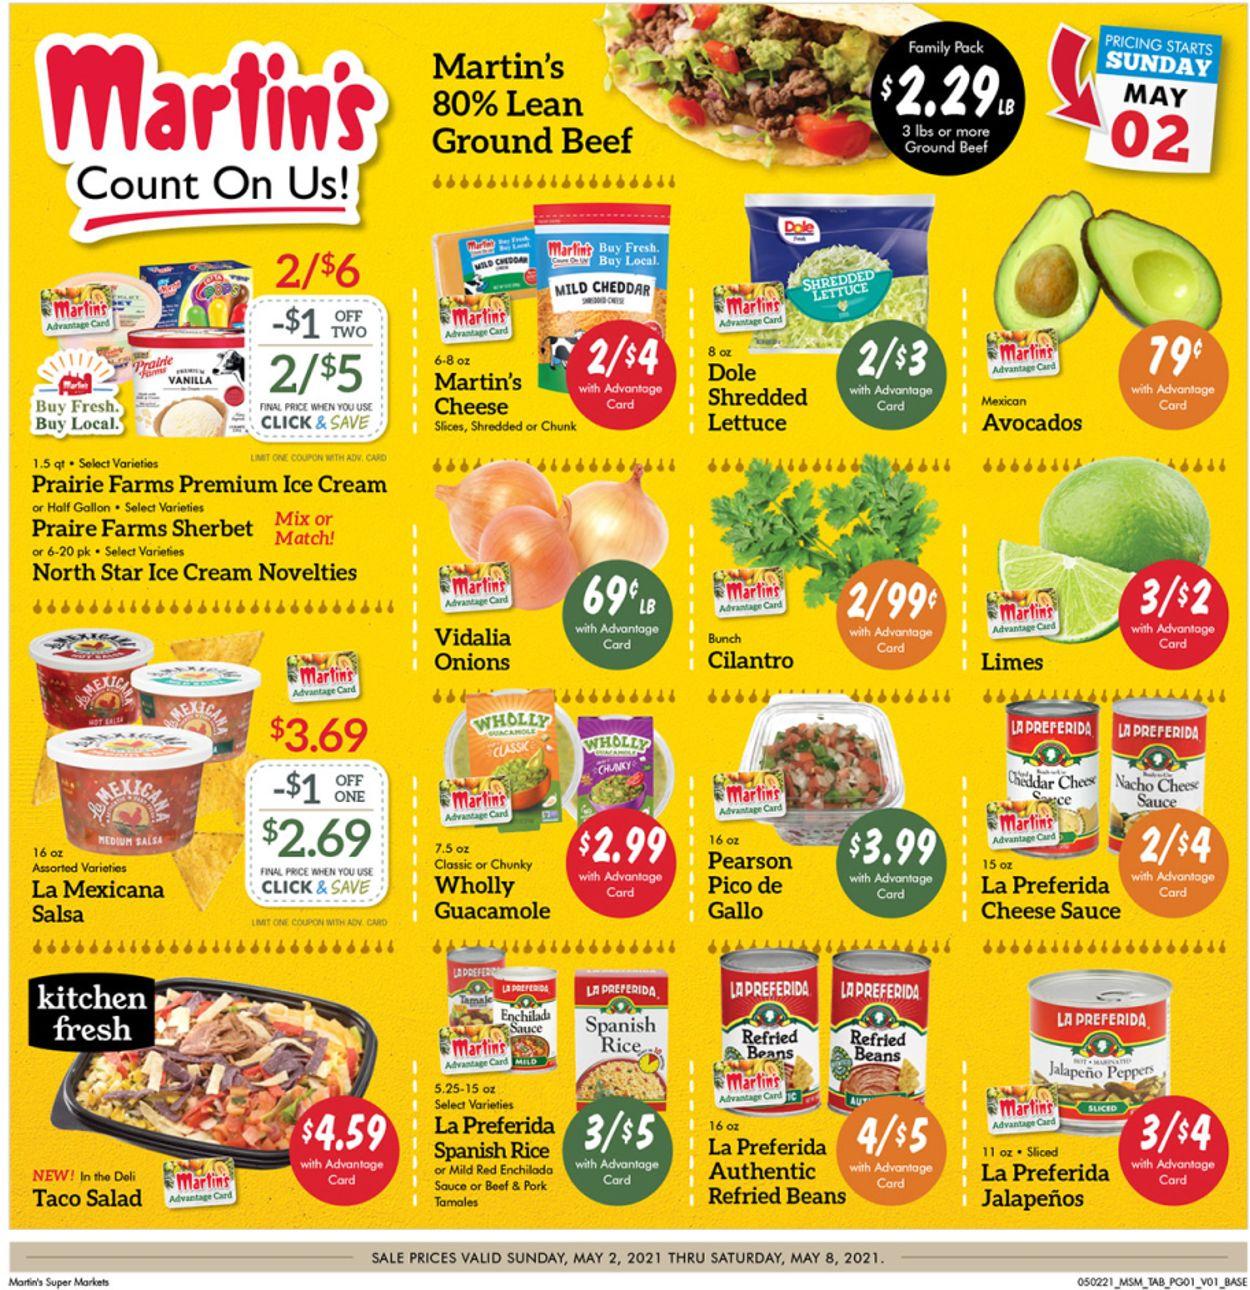 Martin's Weekly Ad Circular - valid 05/02-05/08/2021